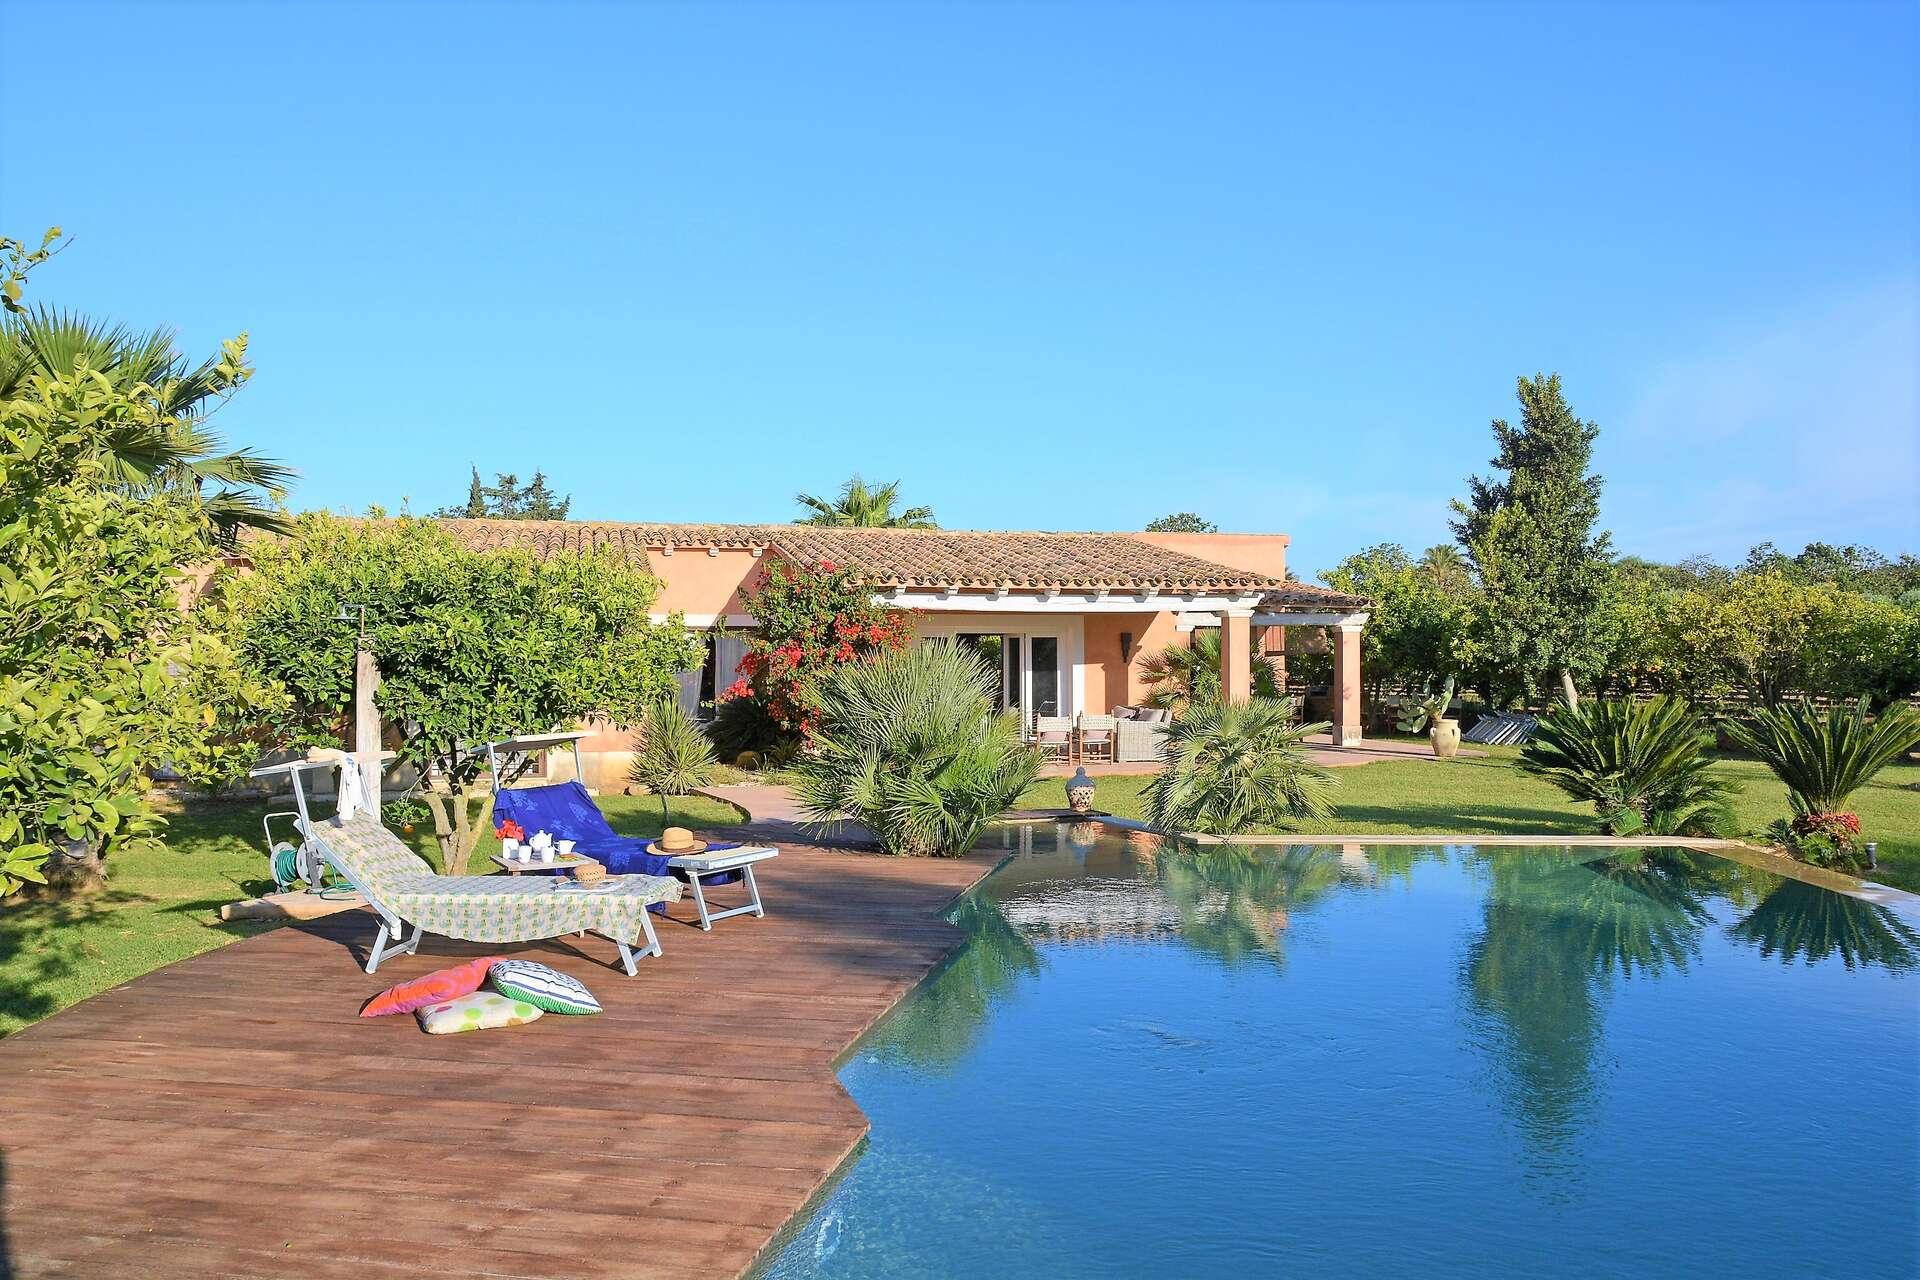 - Villa Zagara - Image 1/27